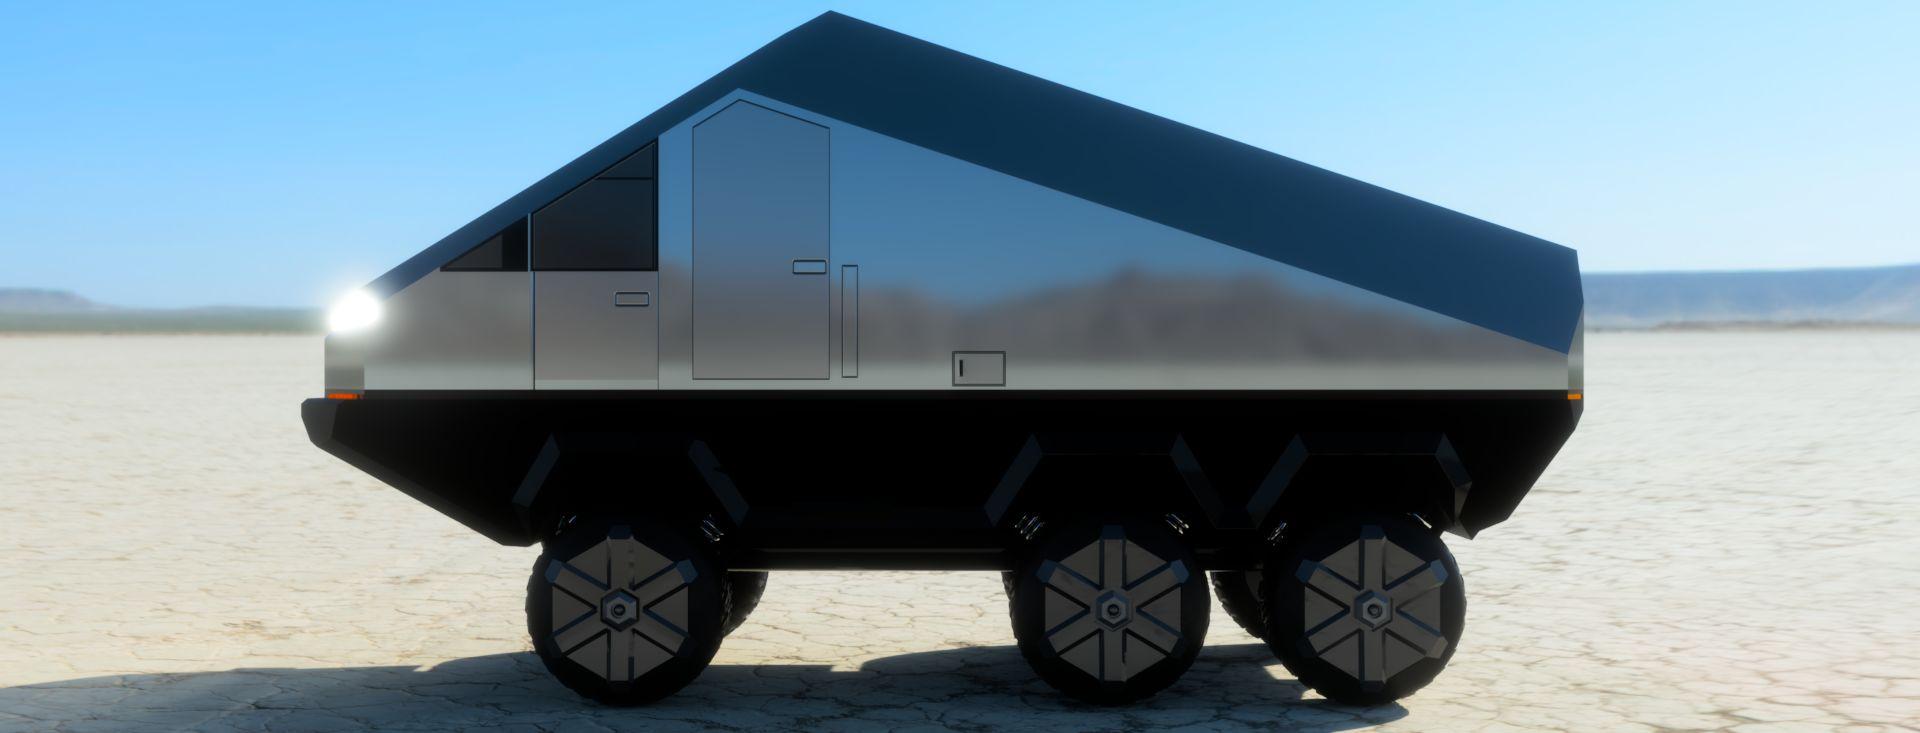 Tesla-semi-cybertruck-2020-apr-14-09-54-35am-000-customizedview3557241789-png-3500-3500